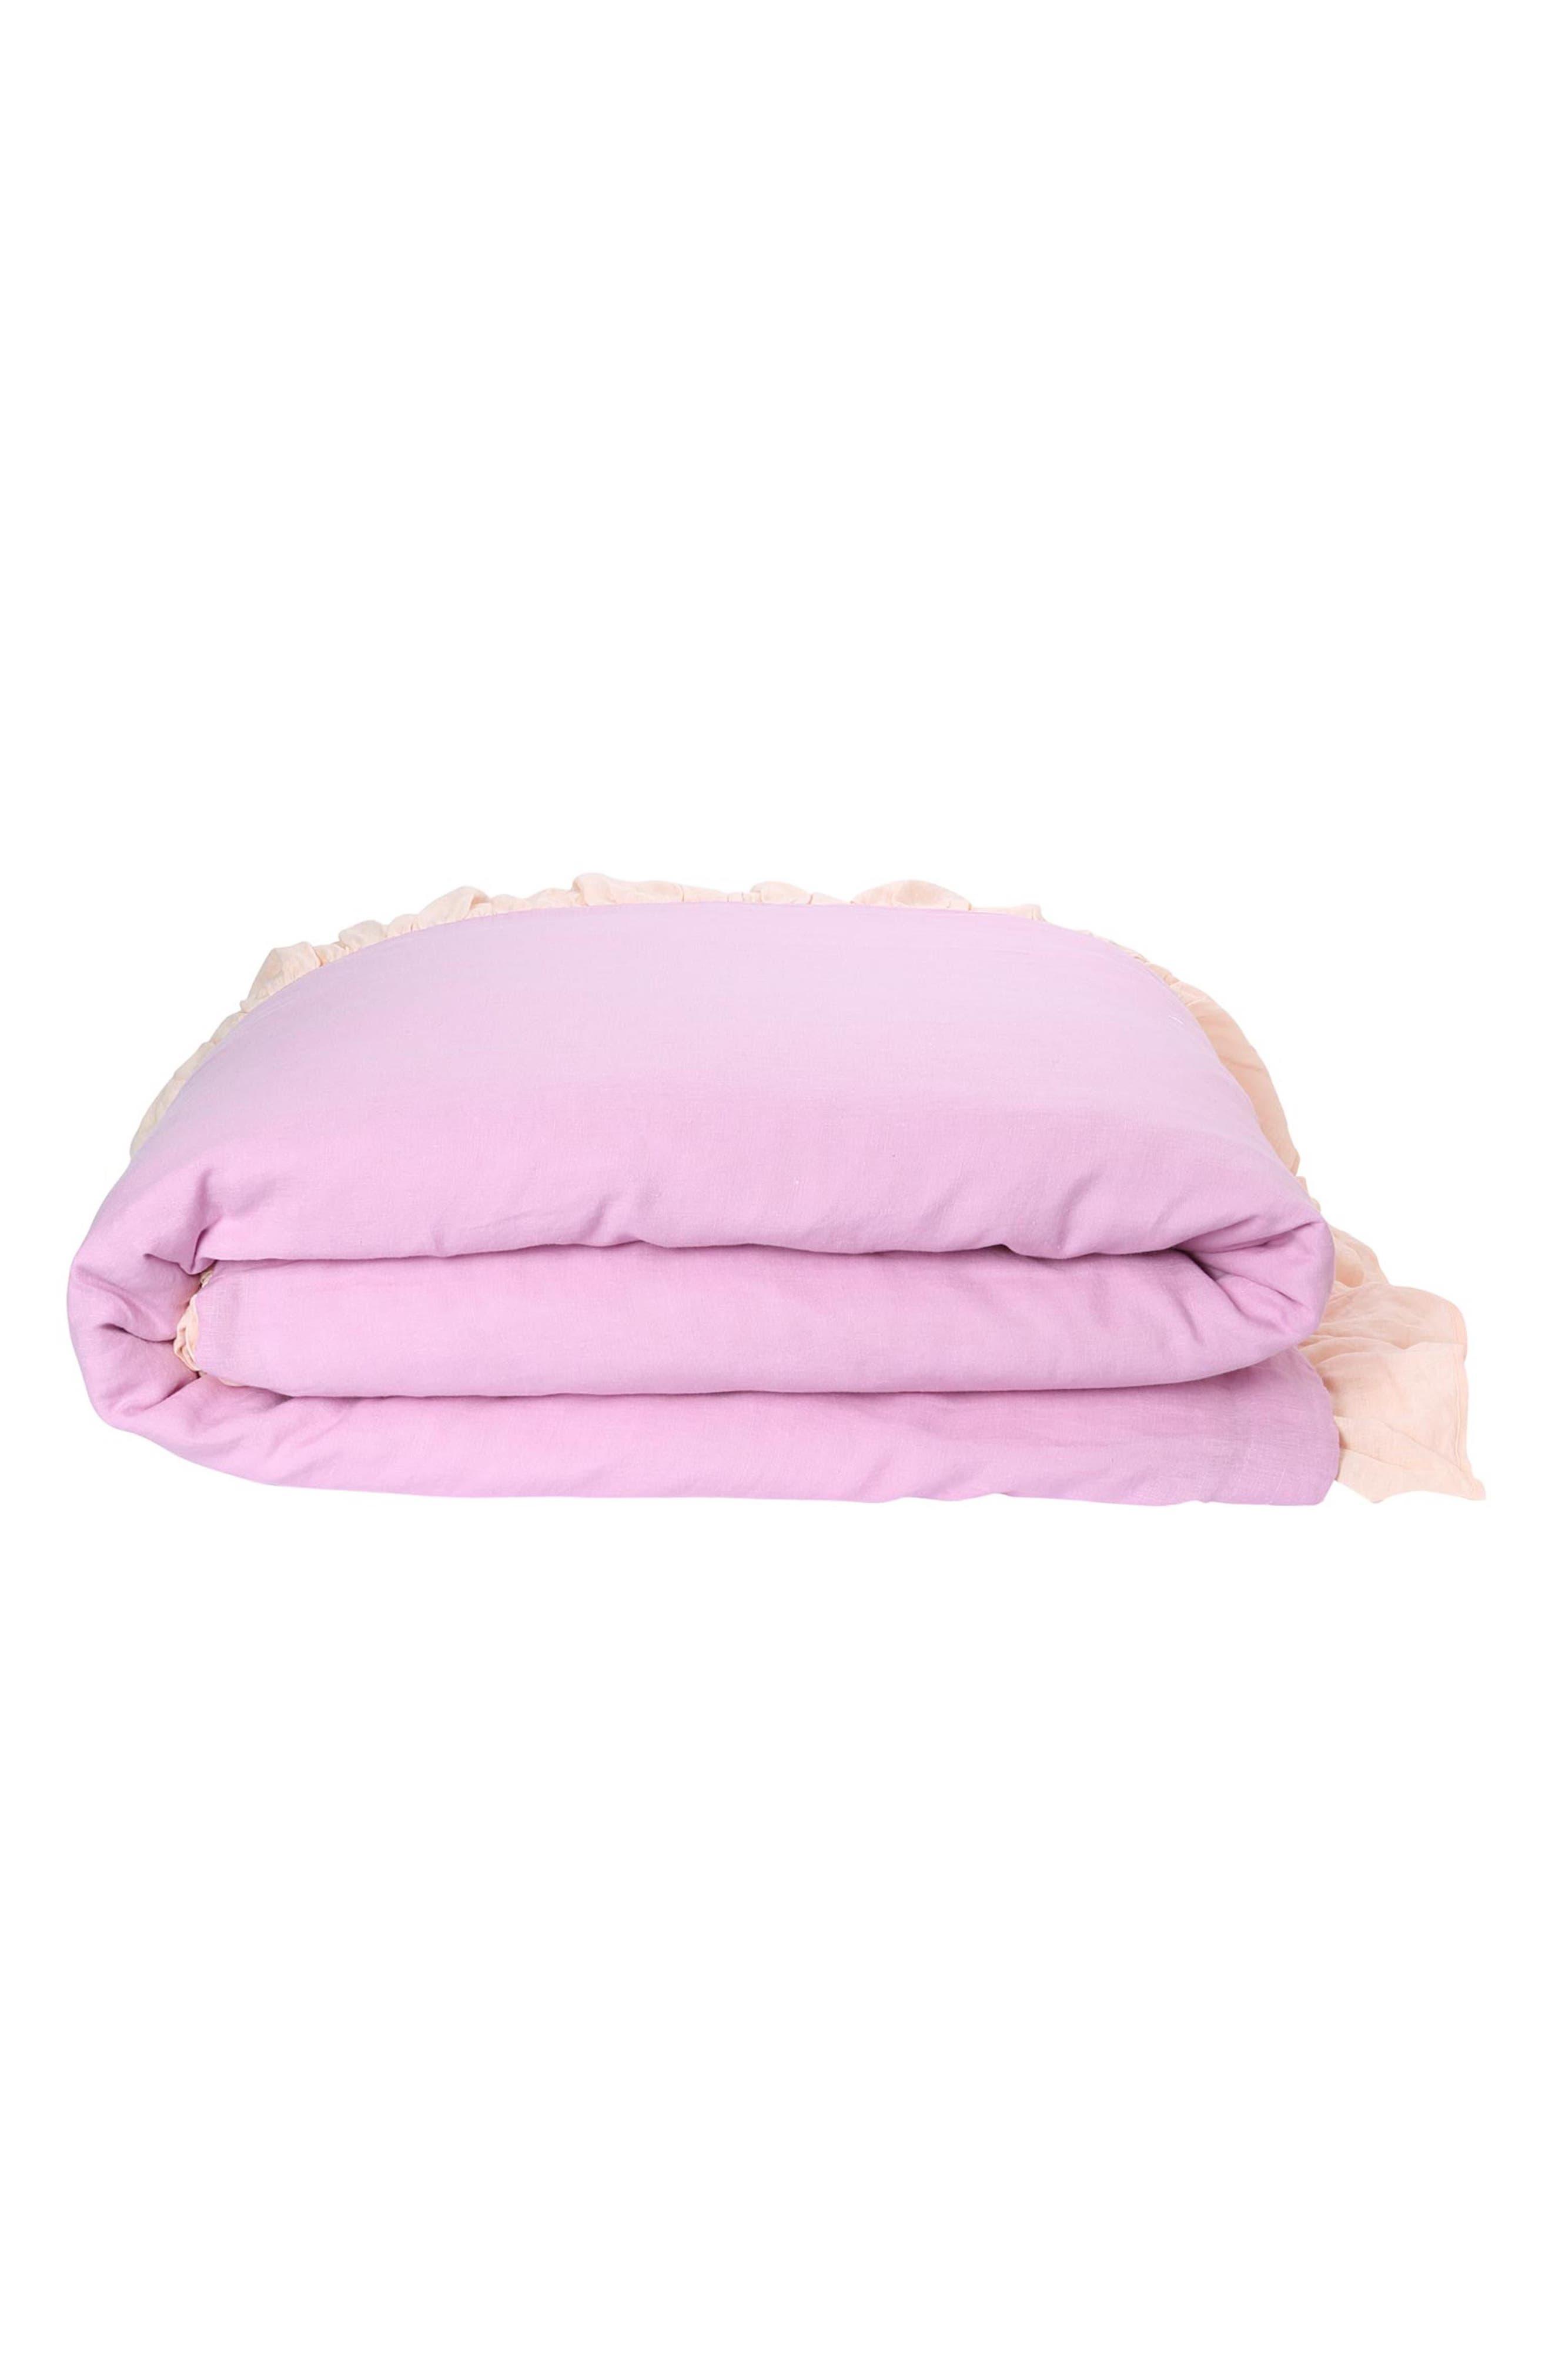 Ruffle Reversible Linen Comforter,                             Main thumbnail 1, color,                             Multi